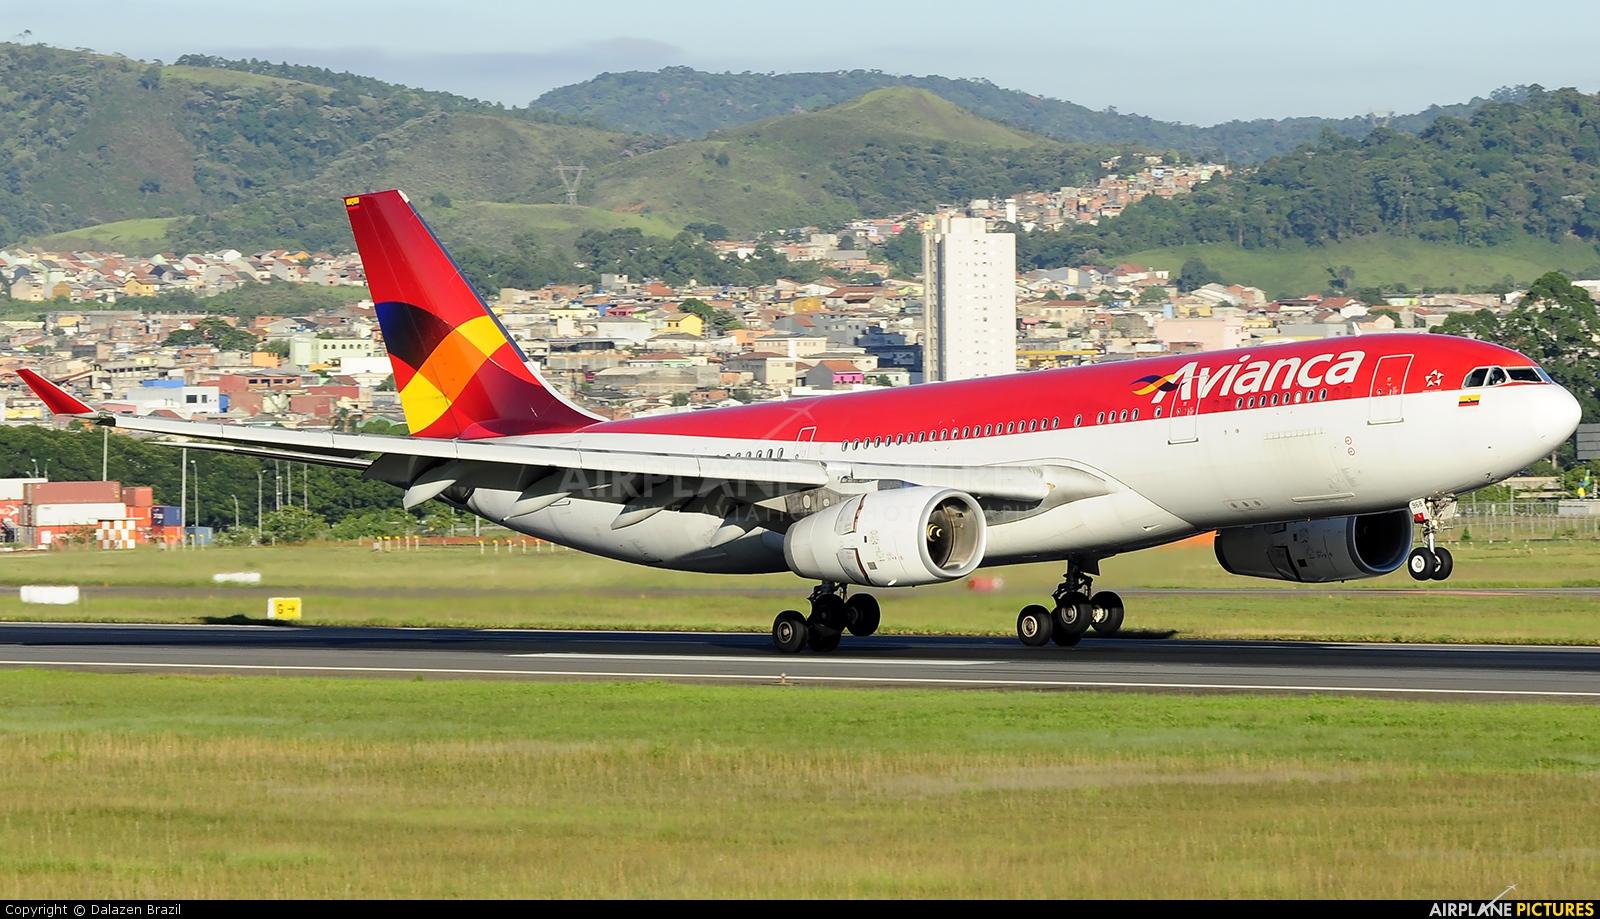 Avianca N968AV aircraft at São Paulo - Guarulhos